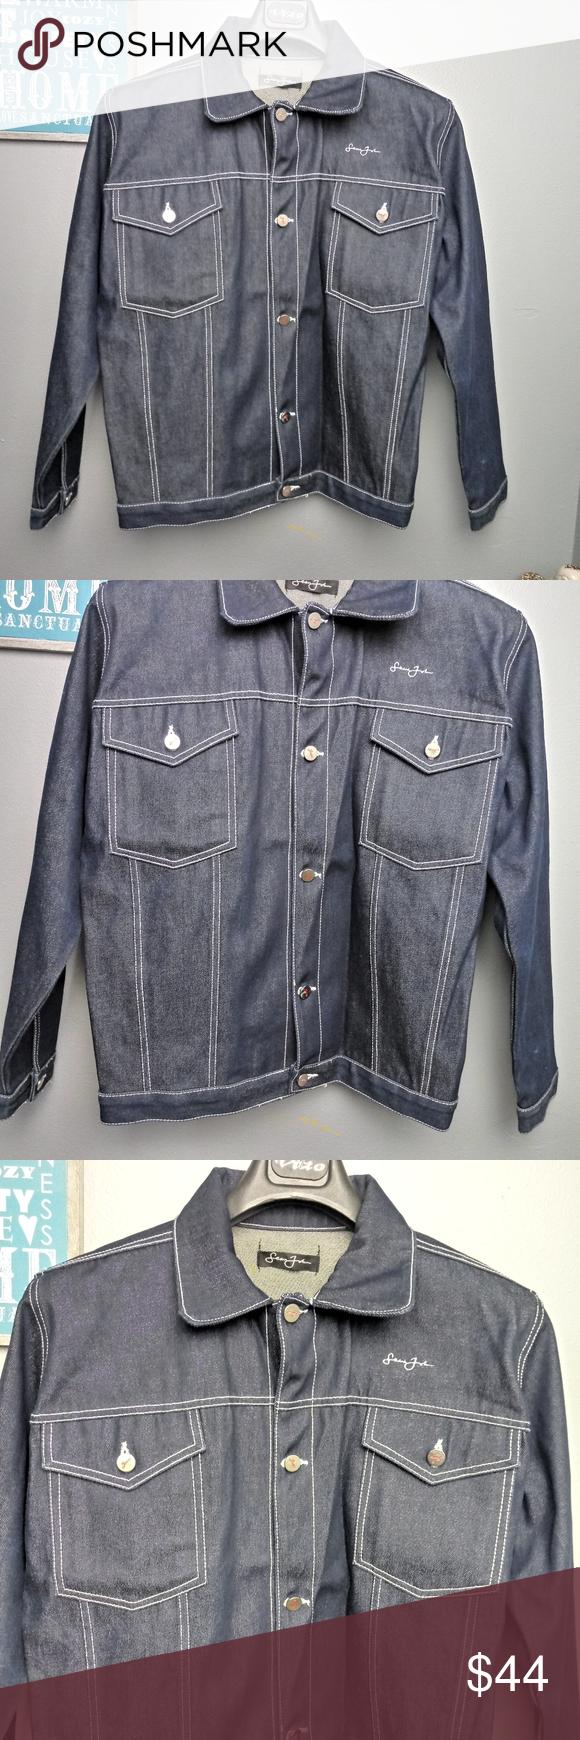 Sean John Men S Denim Jean Jacket Medium Denim Jeans Men Mens Denim Denim Jean Jacket [ 1740 x 580 Pixel ]